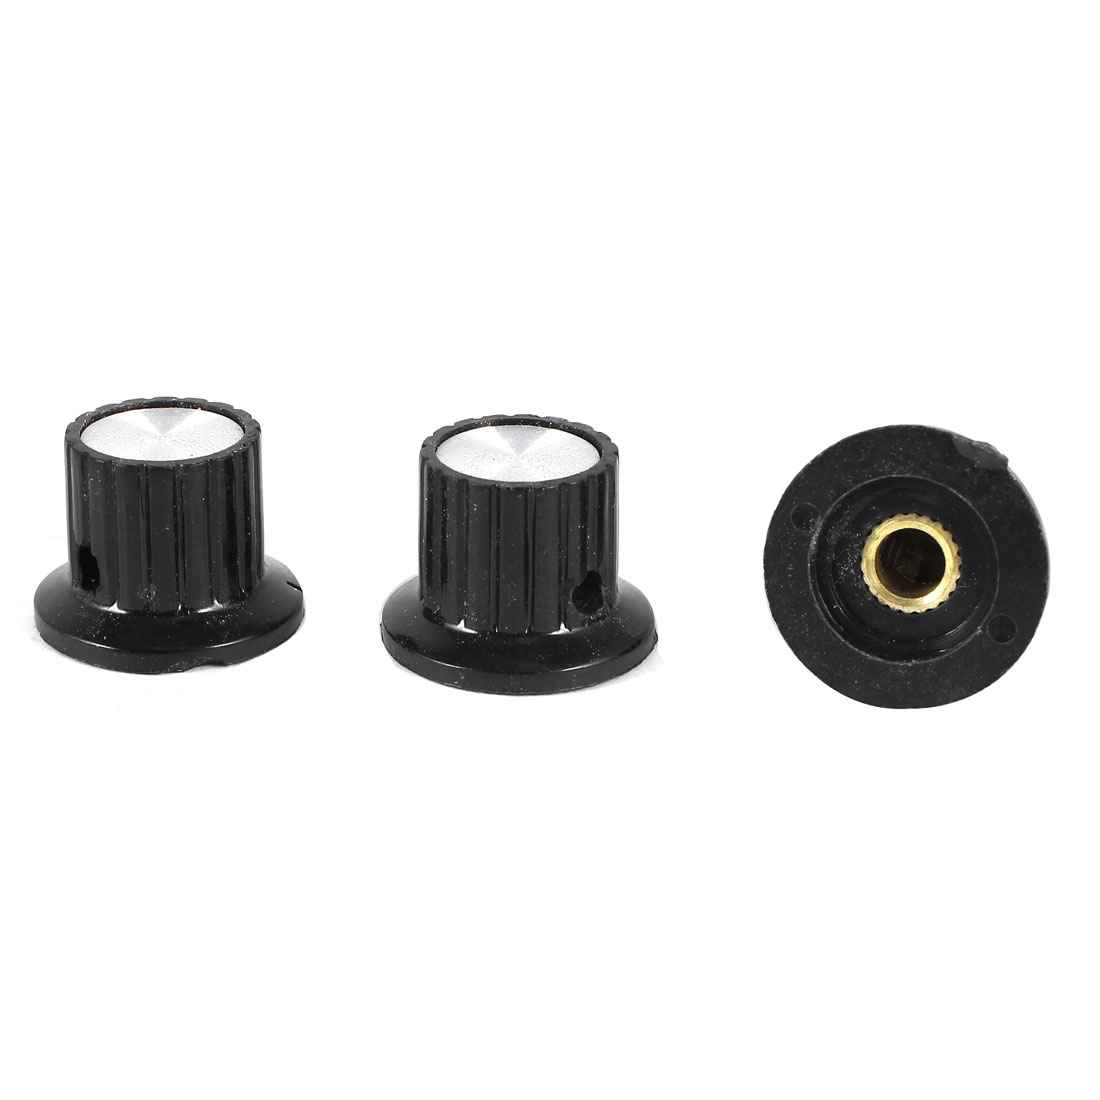 3 Pcs 6mm Hole Diameter Potentiometer Knob Cover Cap 25mmx18mm Black KYP25-18-6J